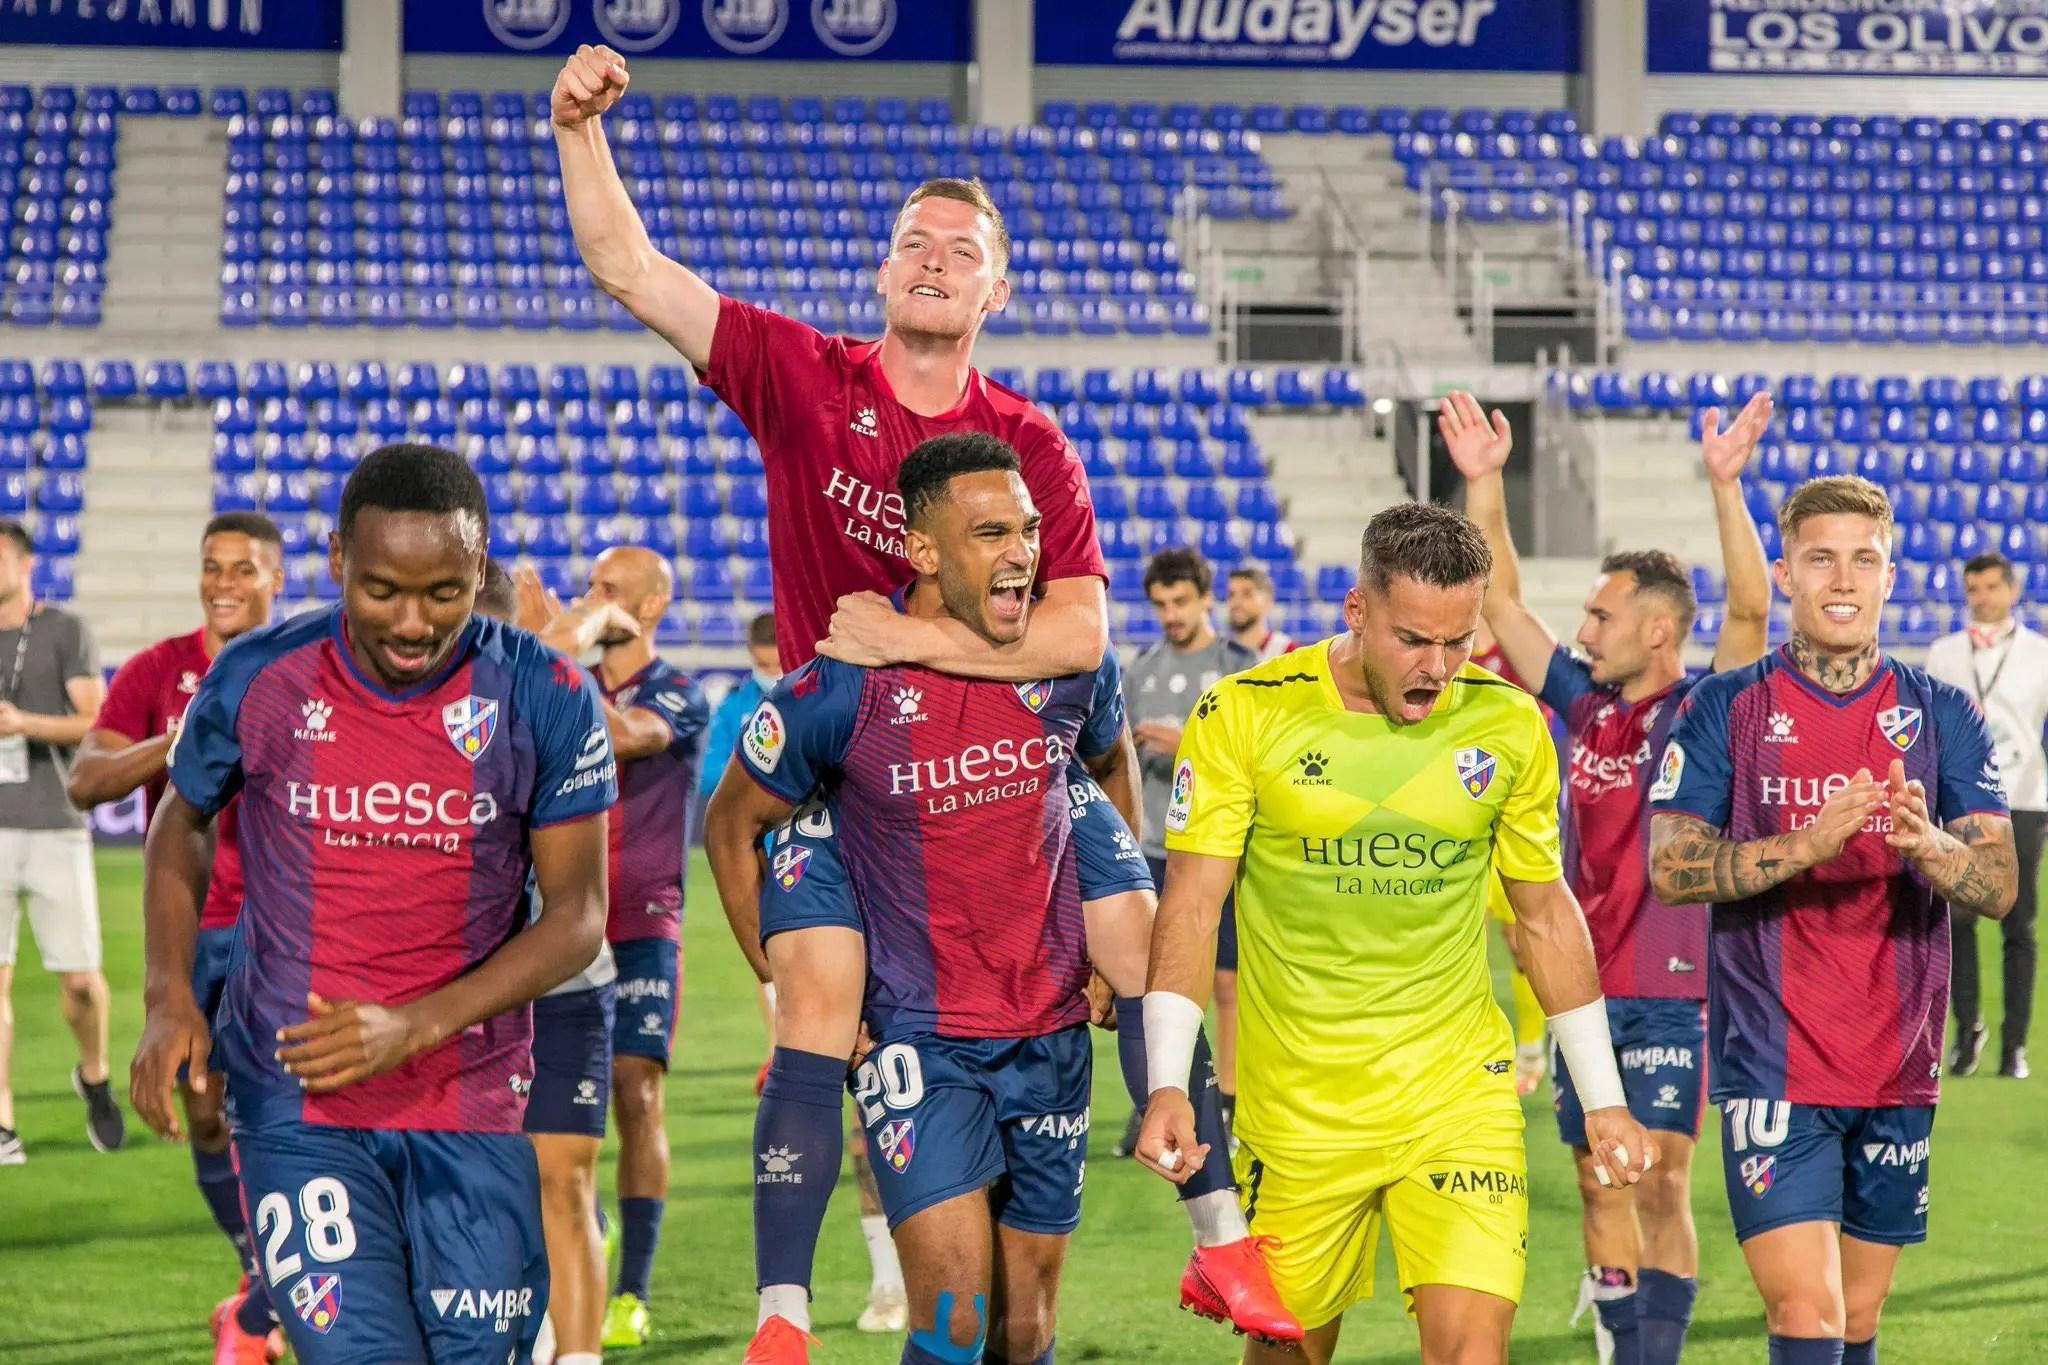 Nwakali Wins LaLiga 2 Title With Huesca